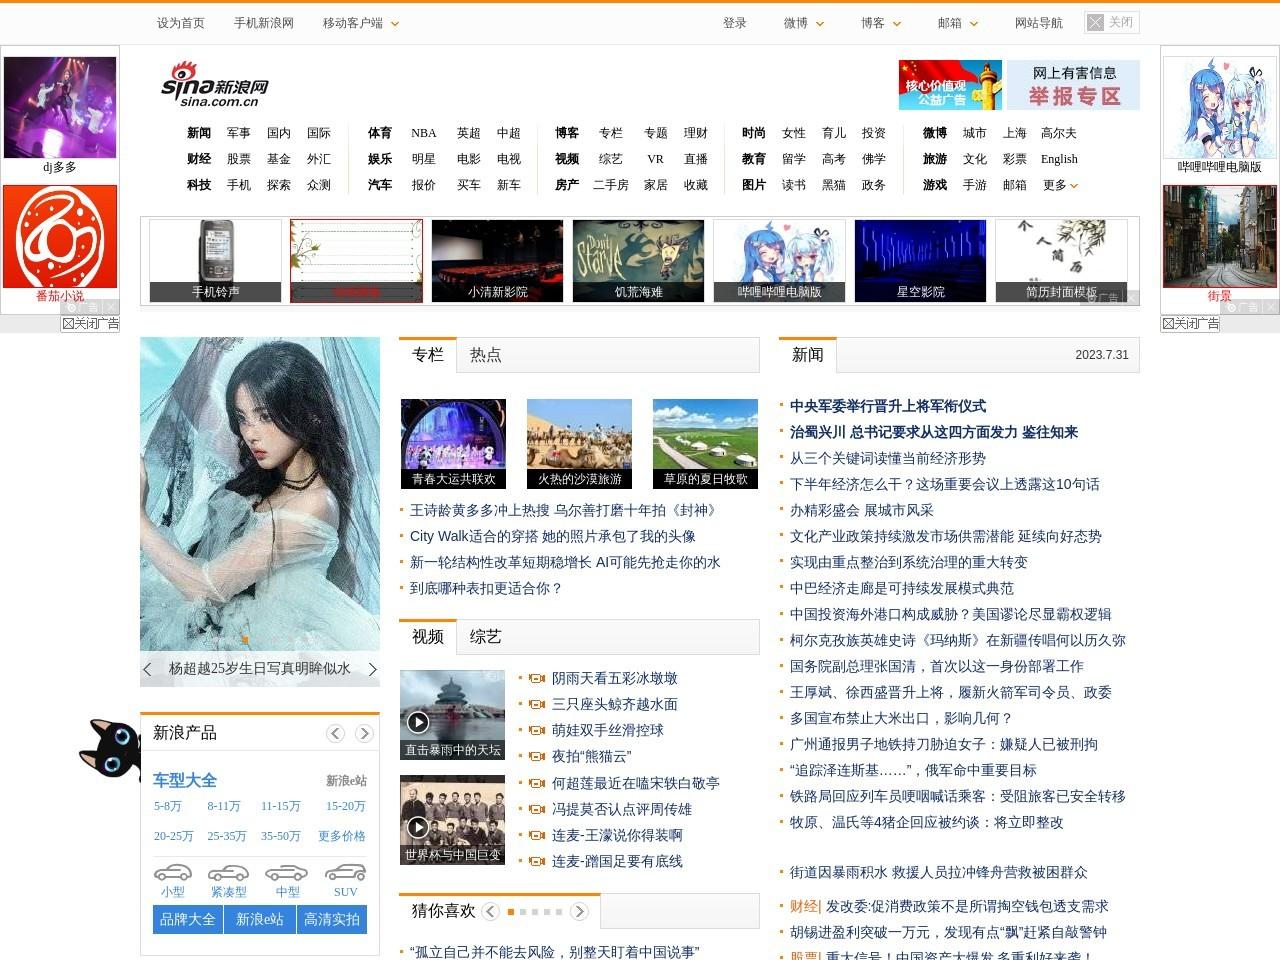 www.sina.com.cn